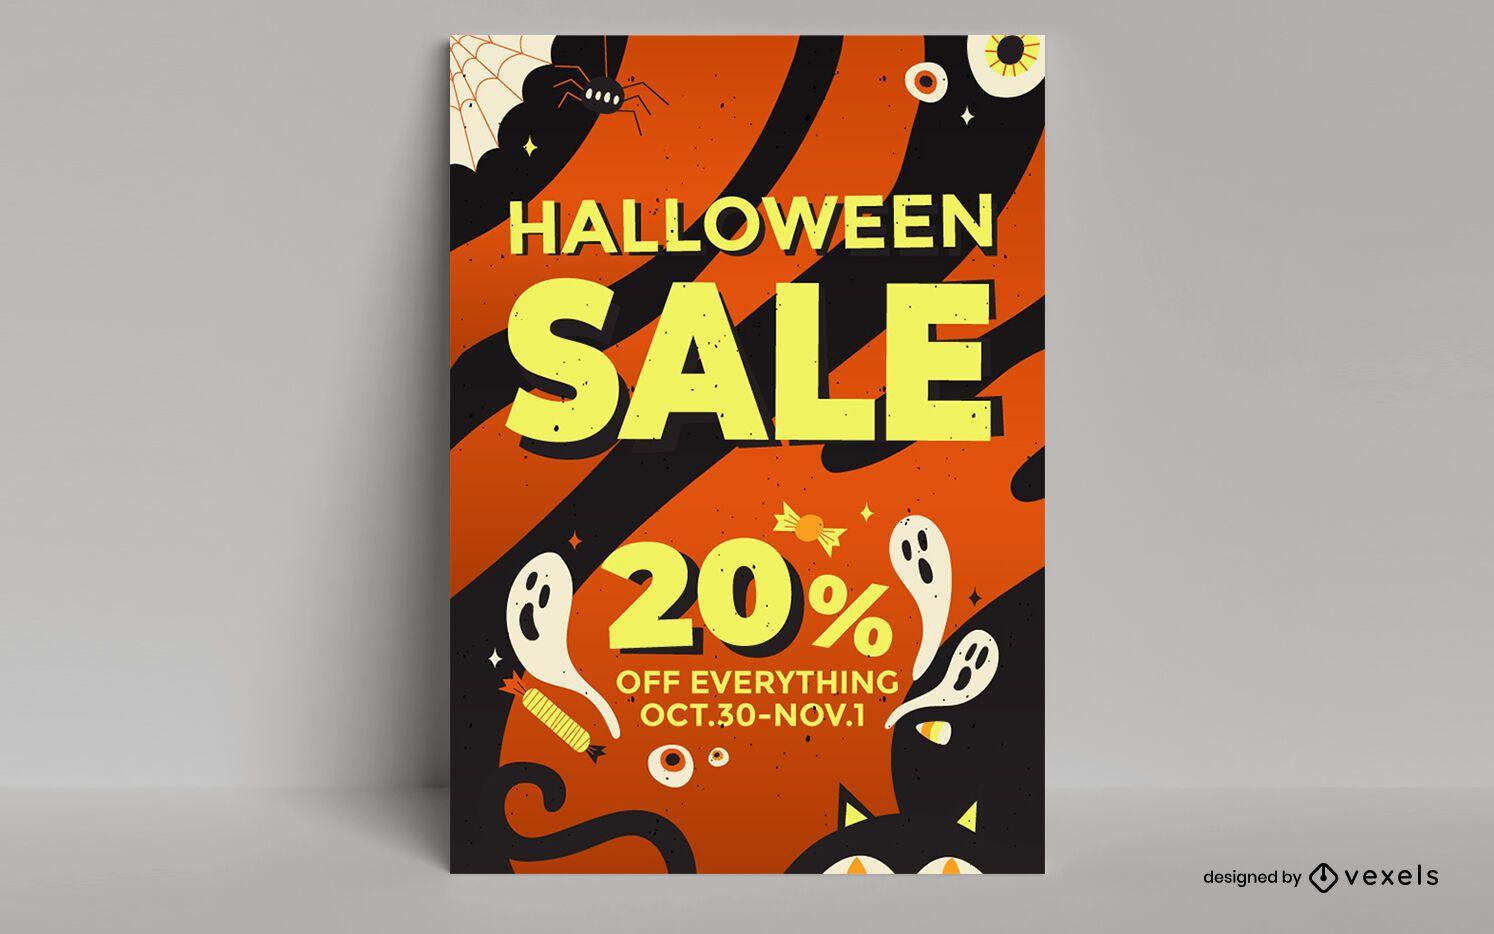 Halloween sale poster design